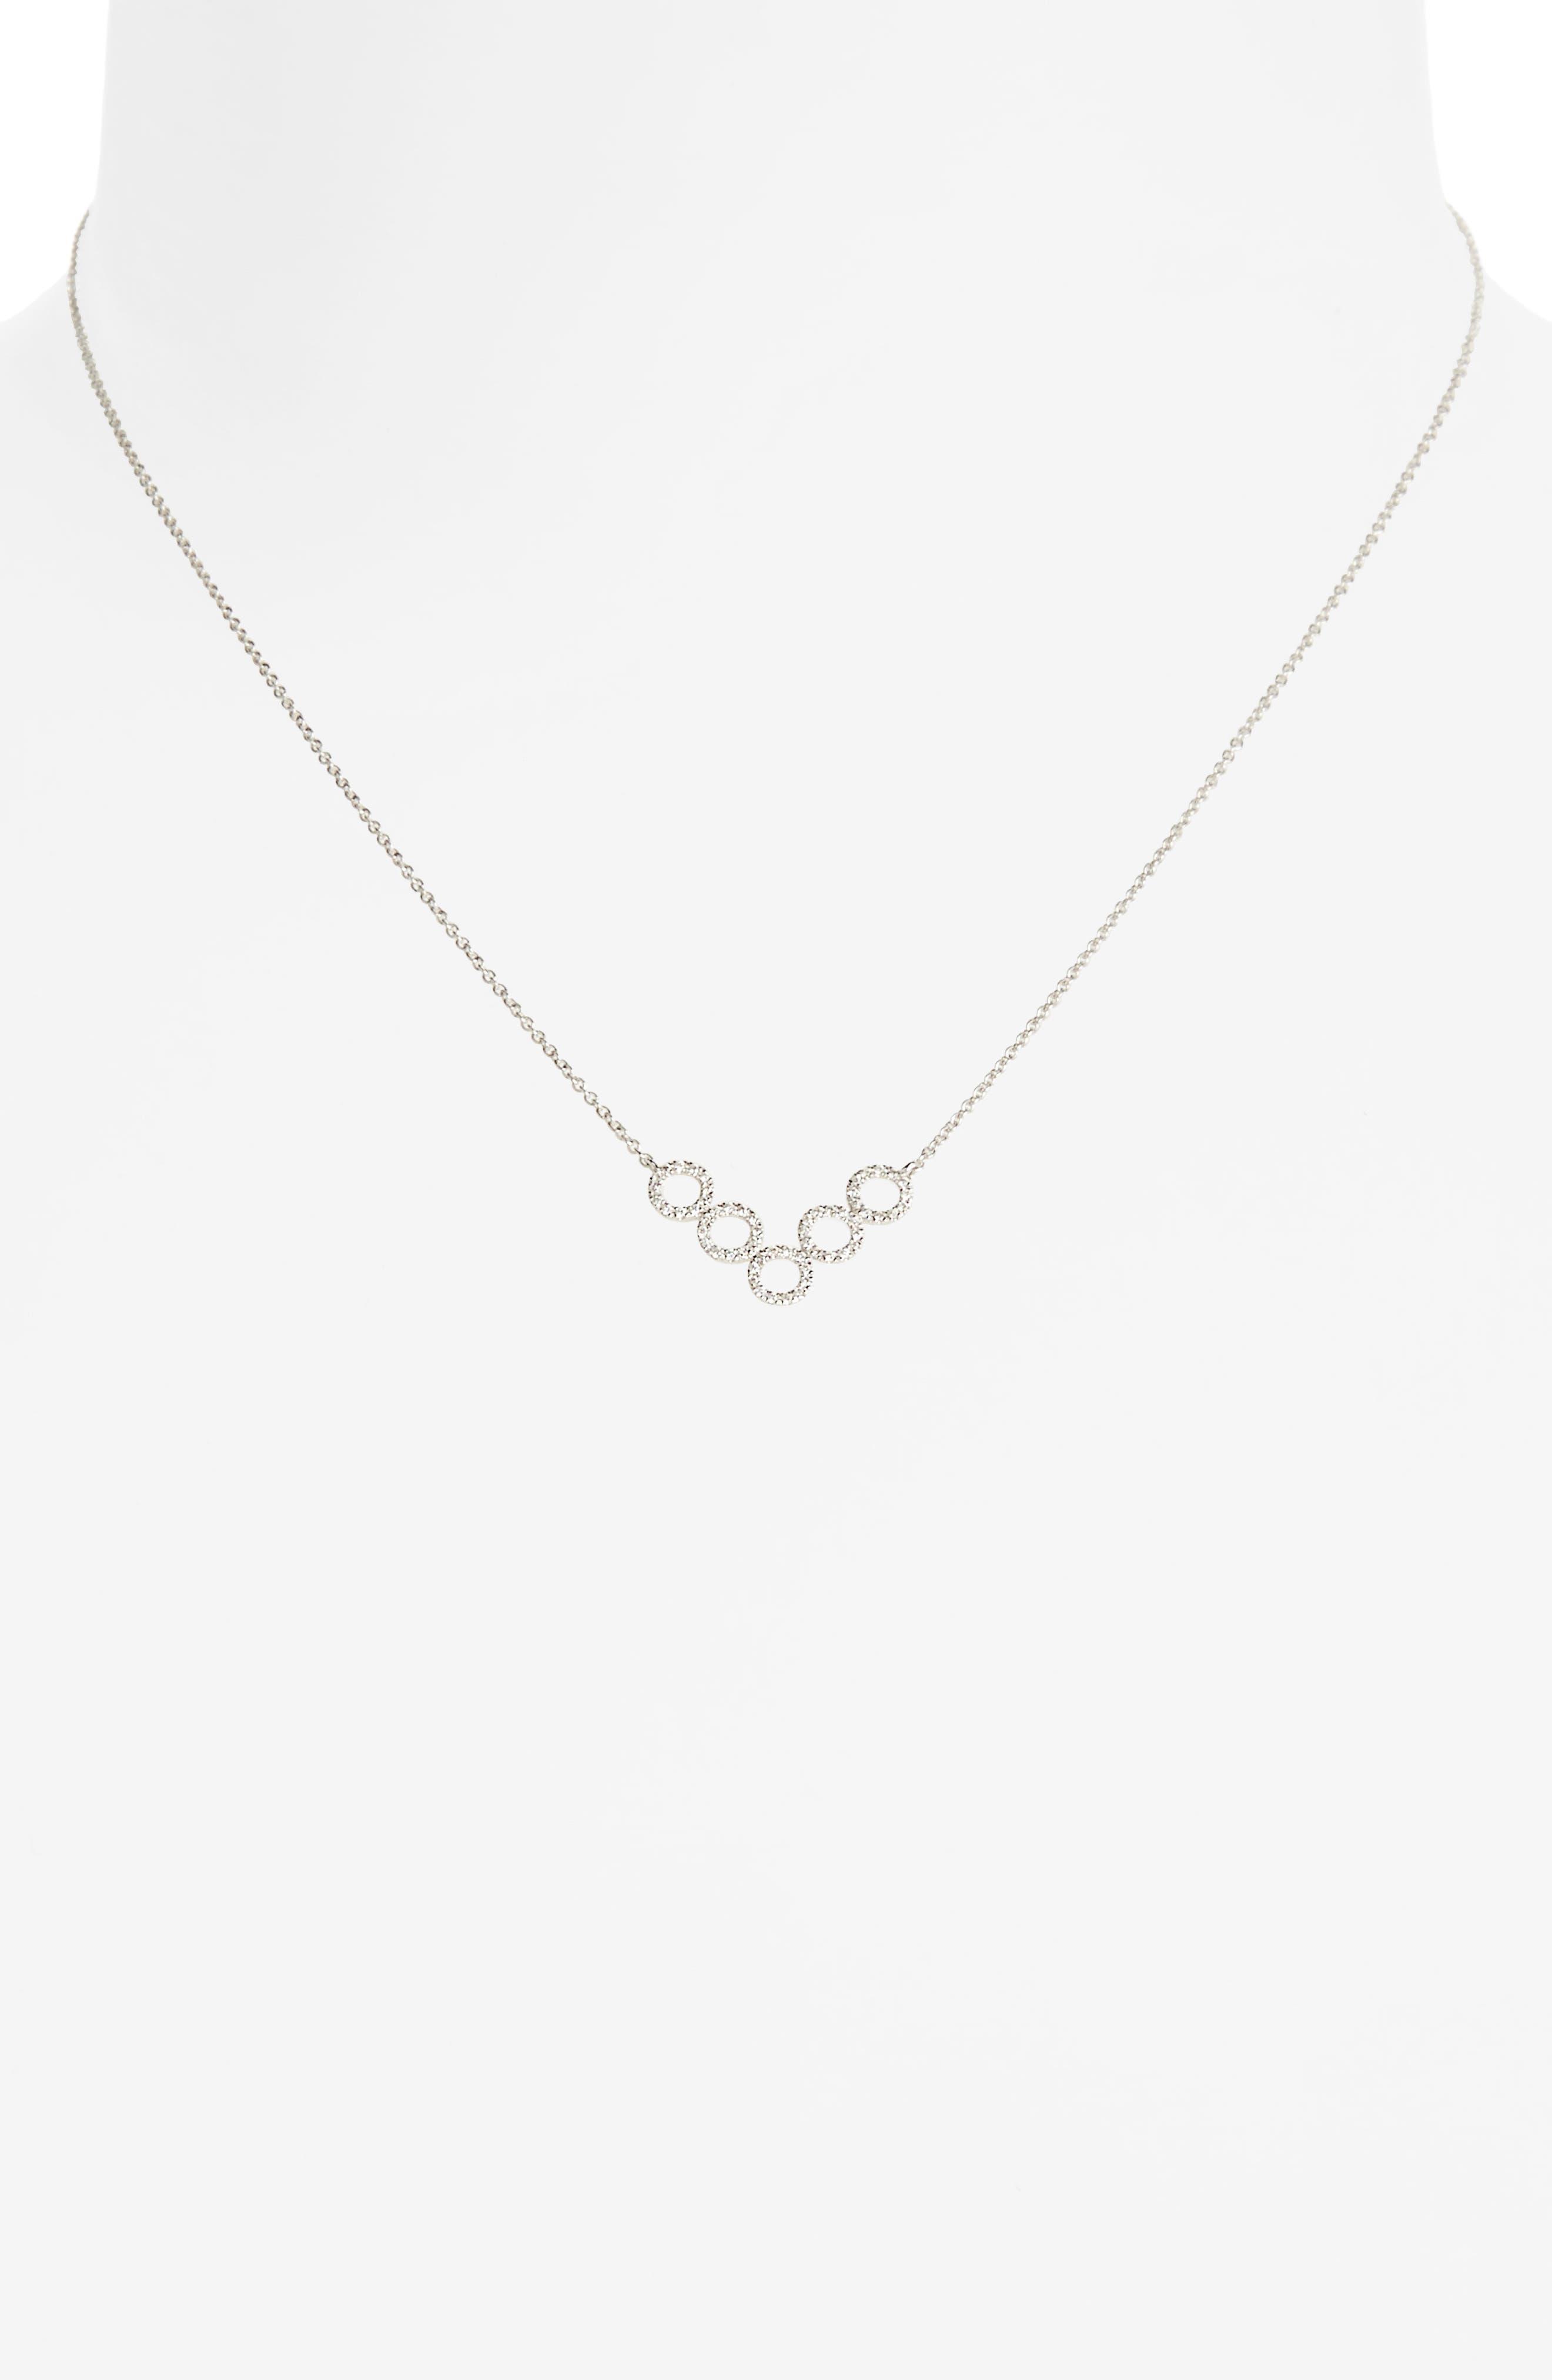 Geometric Circle Pendant Necklace,                         Main,                         color, White Gold